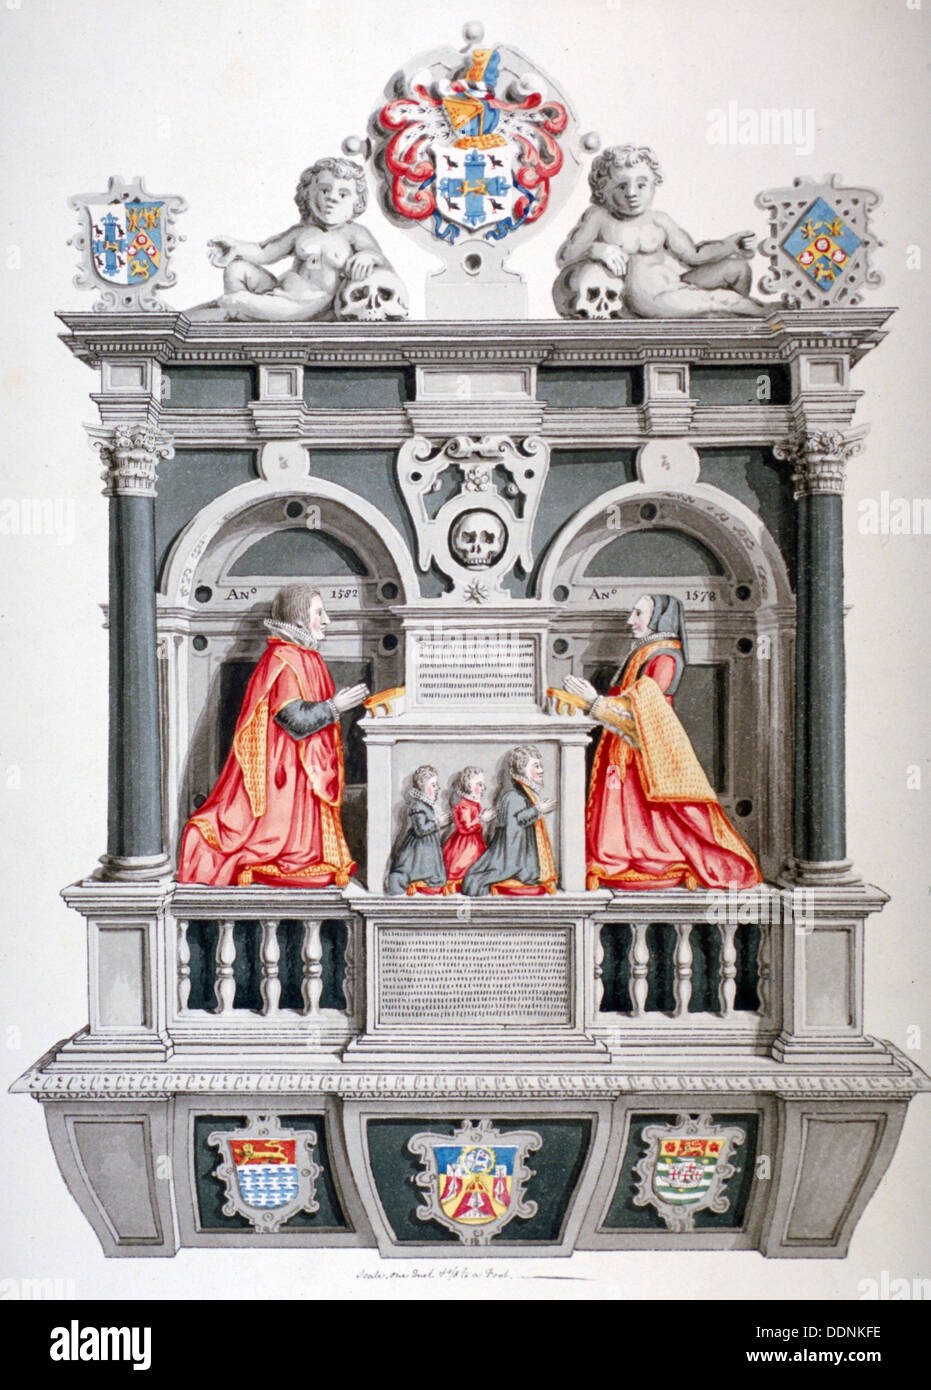 Monument in the Church of St Andrew Undershaft, Leadenhall Street, London, c1810 Artist: Thomas Fisher - Stock Image